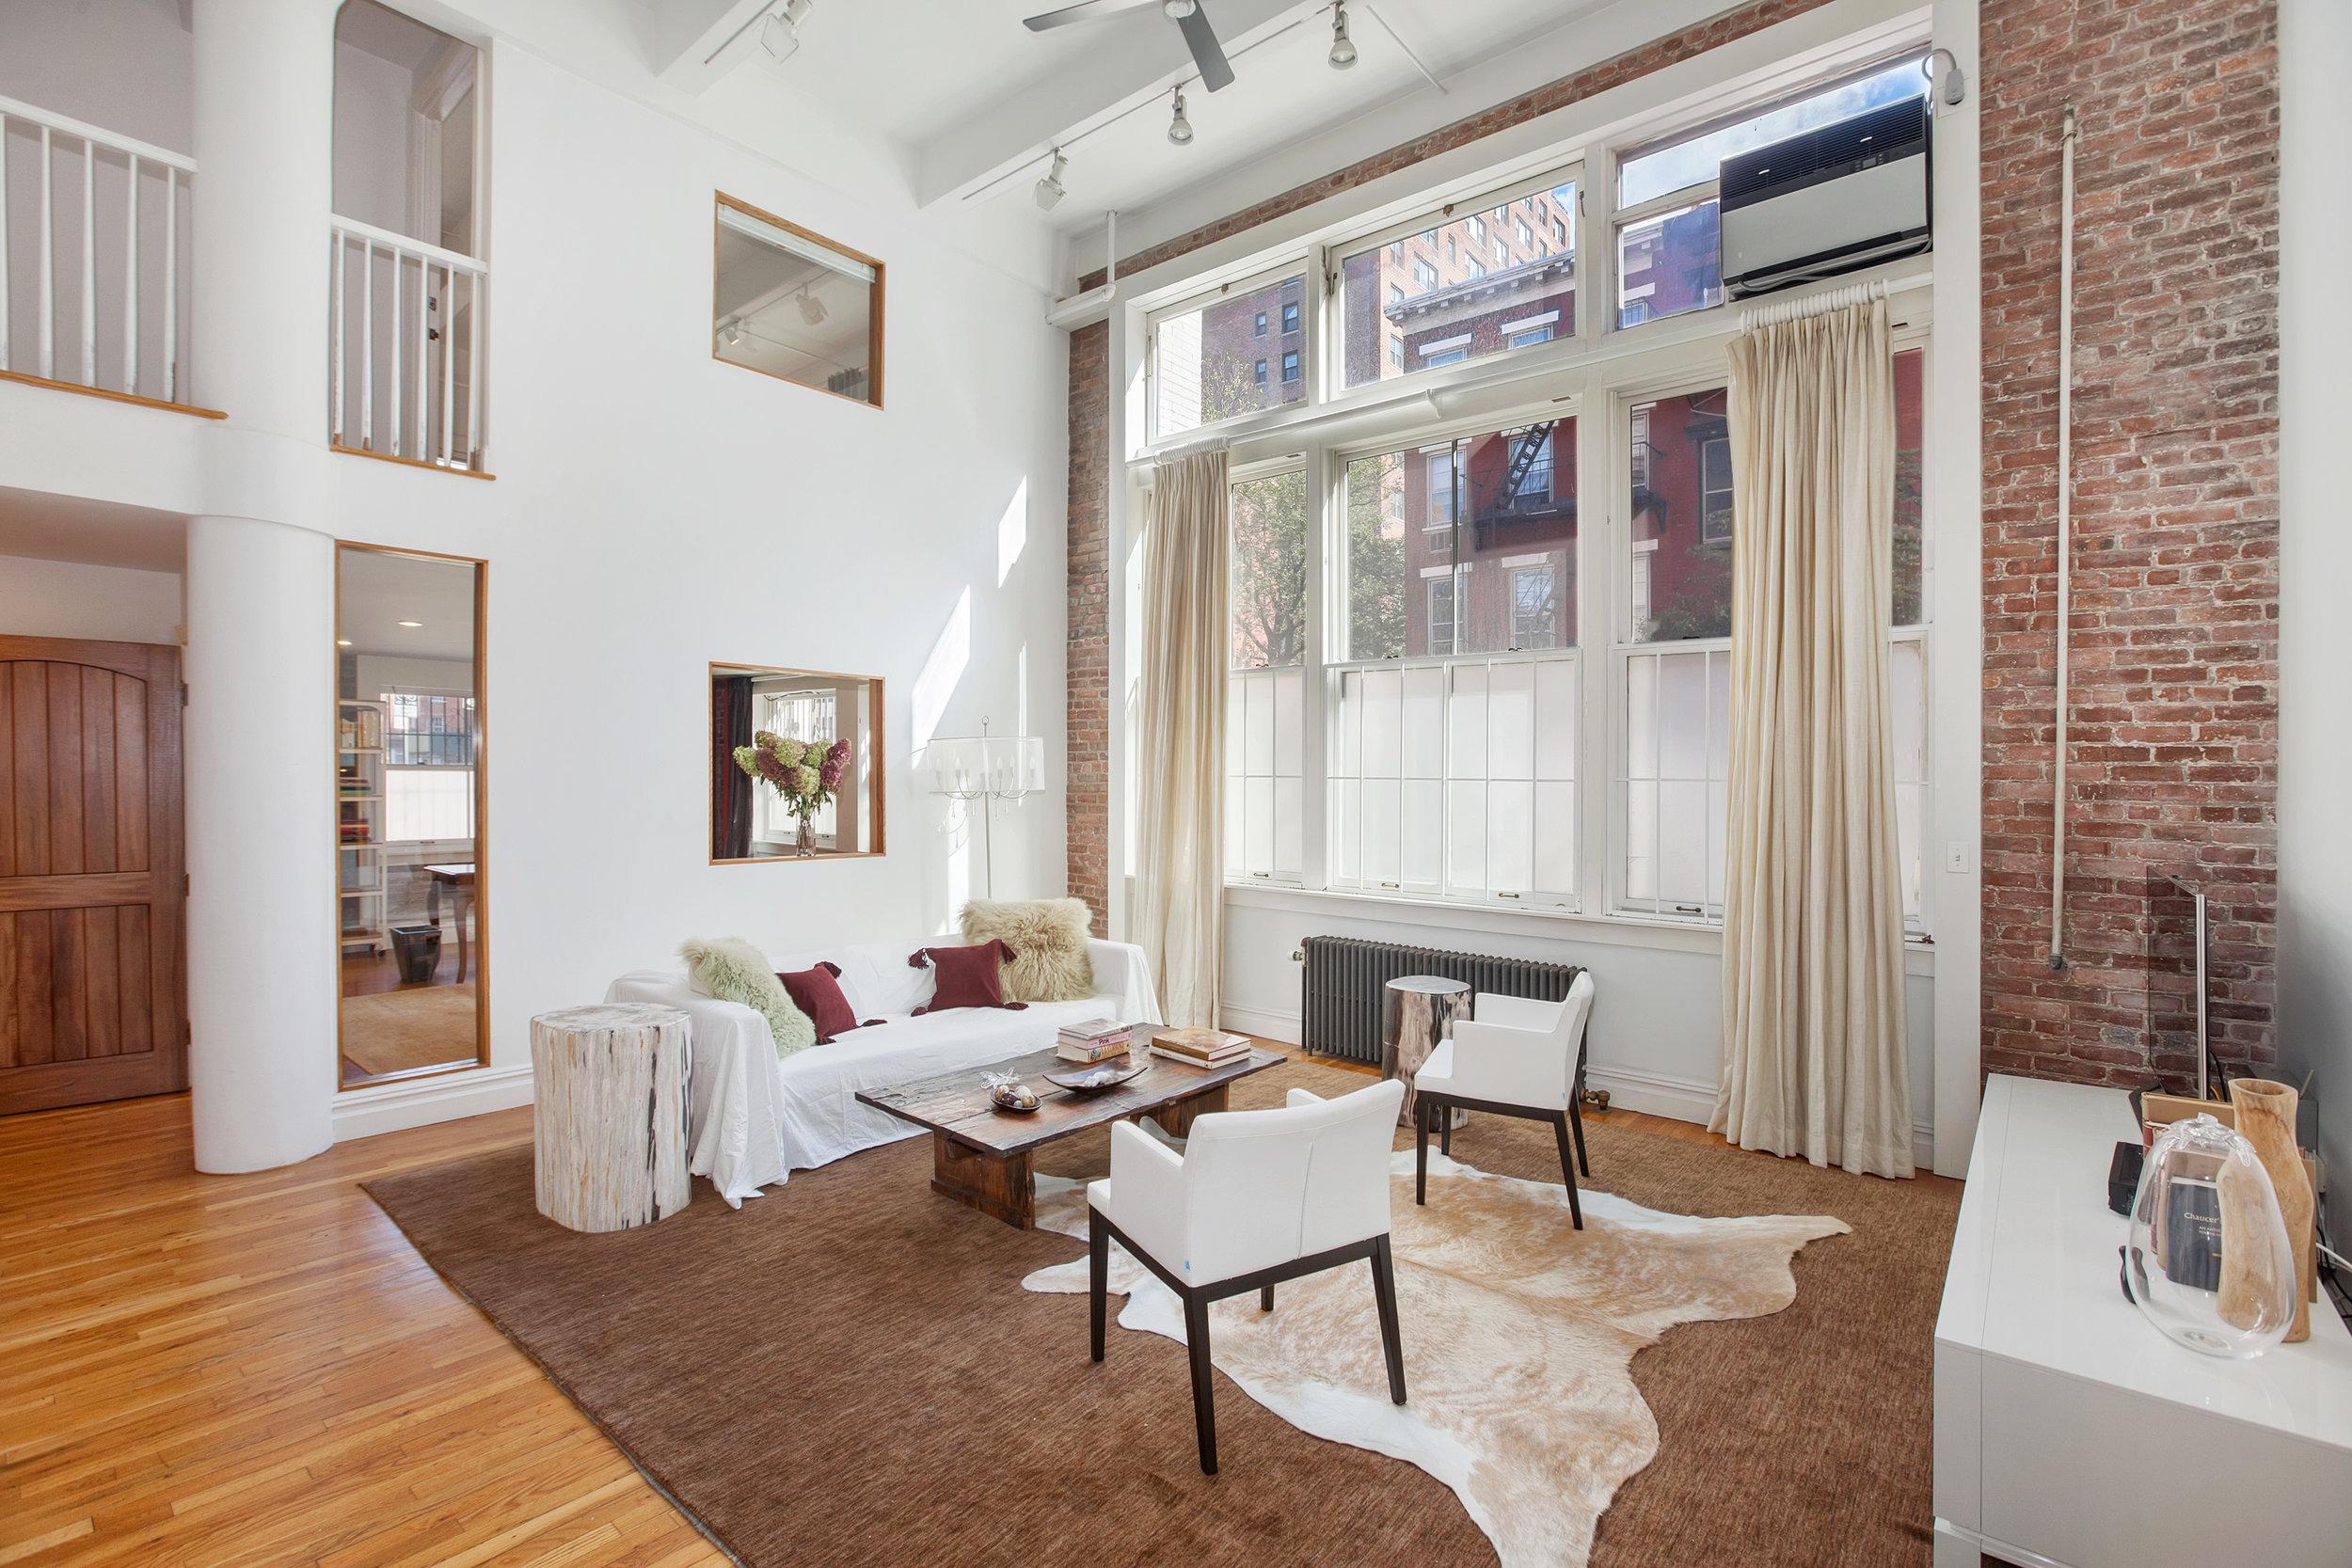 68 Jane Street, Unit 1E - $4,995,000